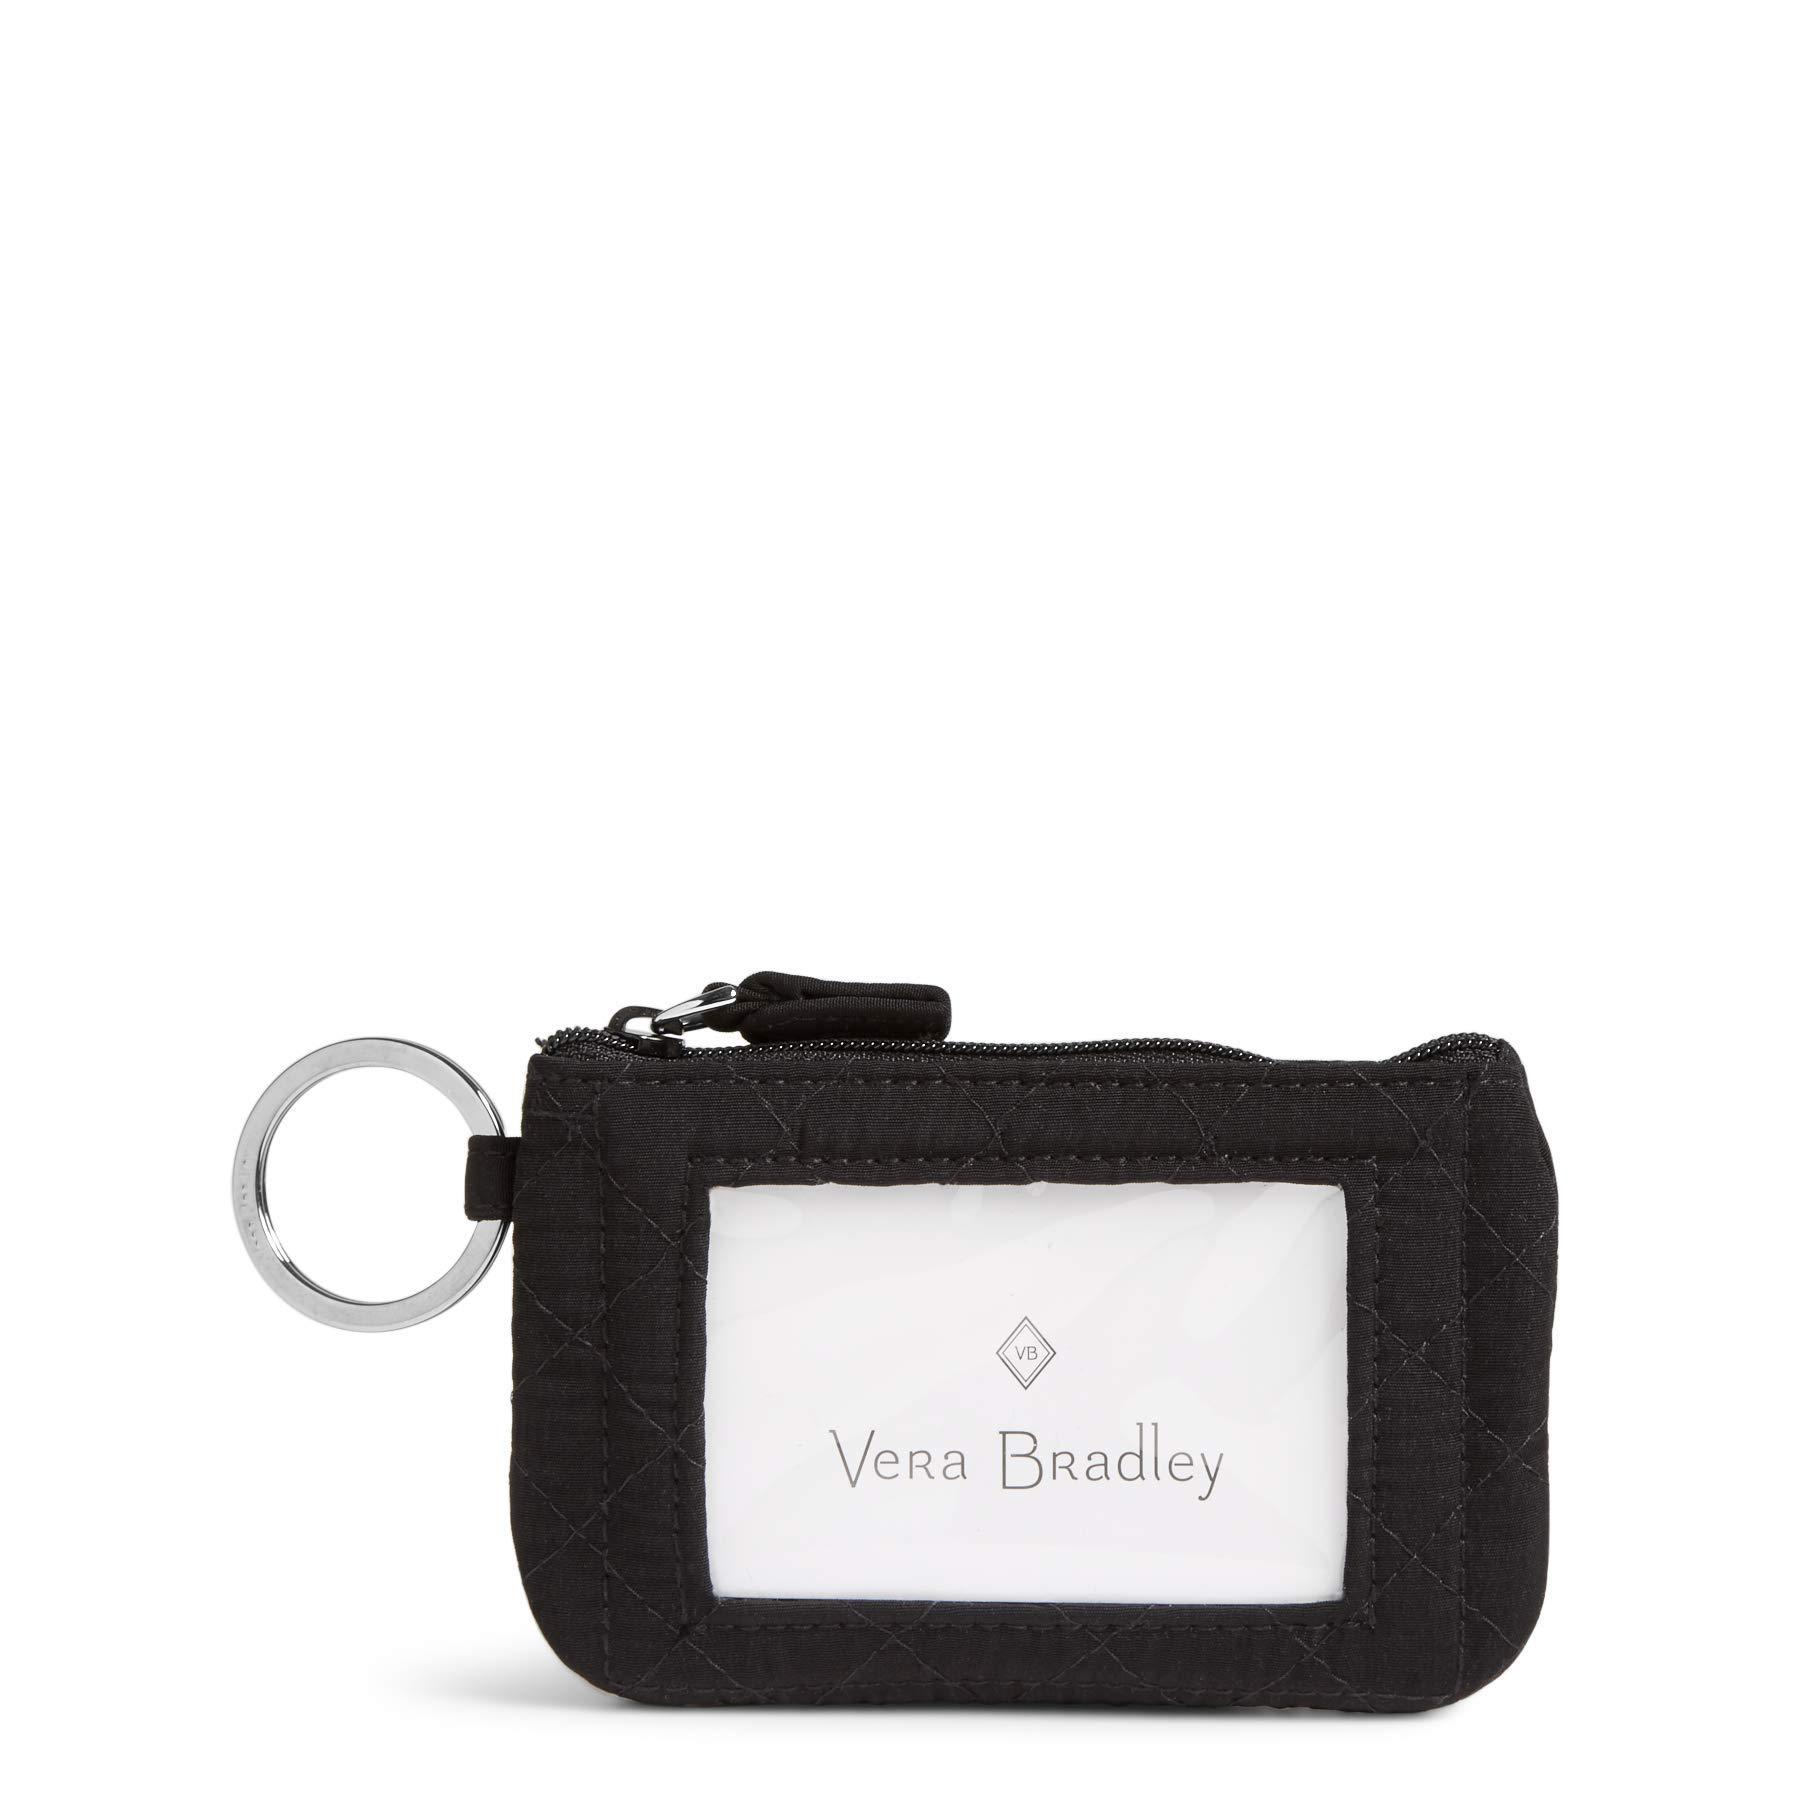 Vera Bradley Women's Iconic Zip Id Case Vv, Classic Black by Vera Bradley